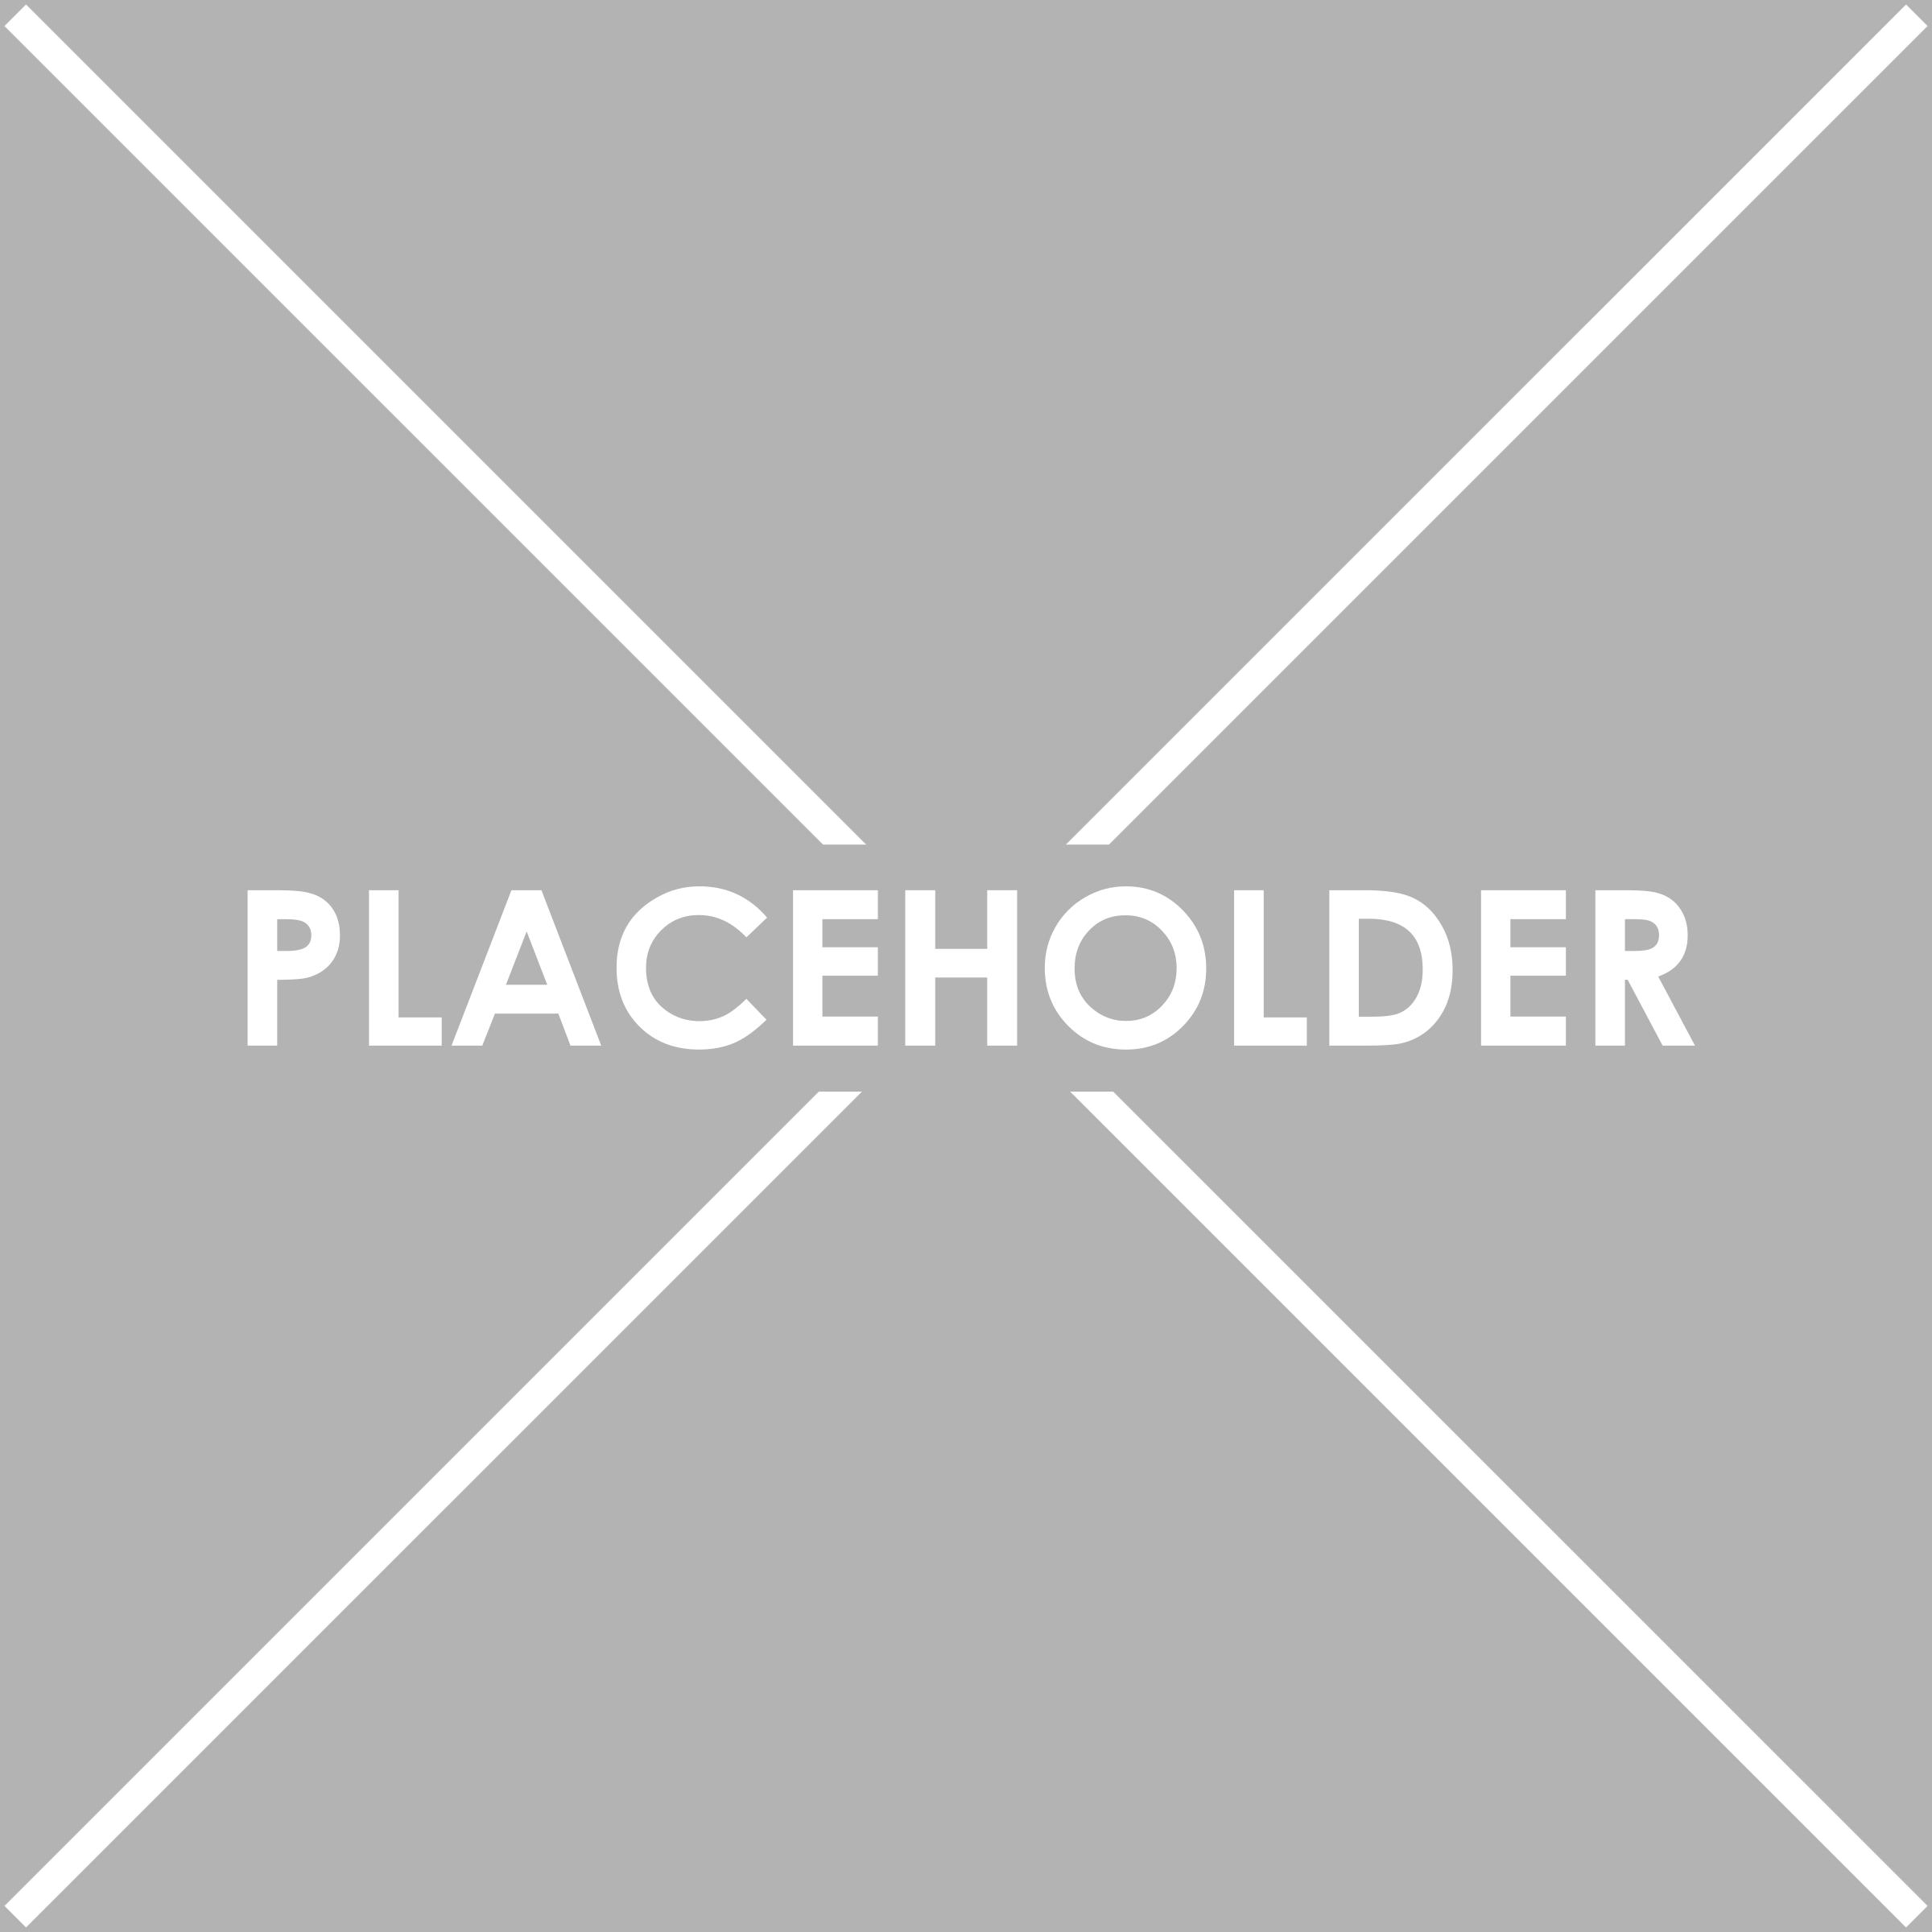 Placeholder copy 5.png